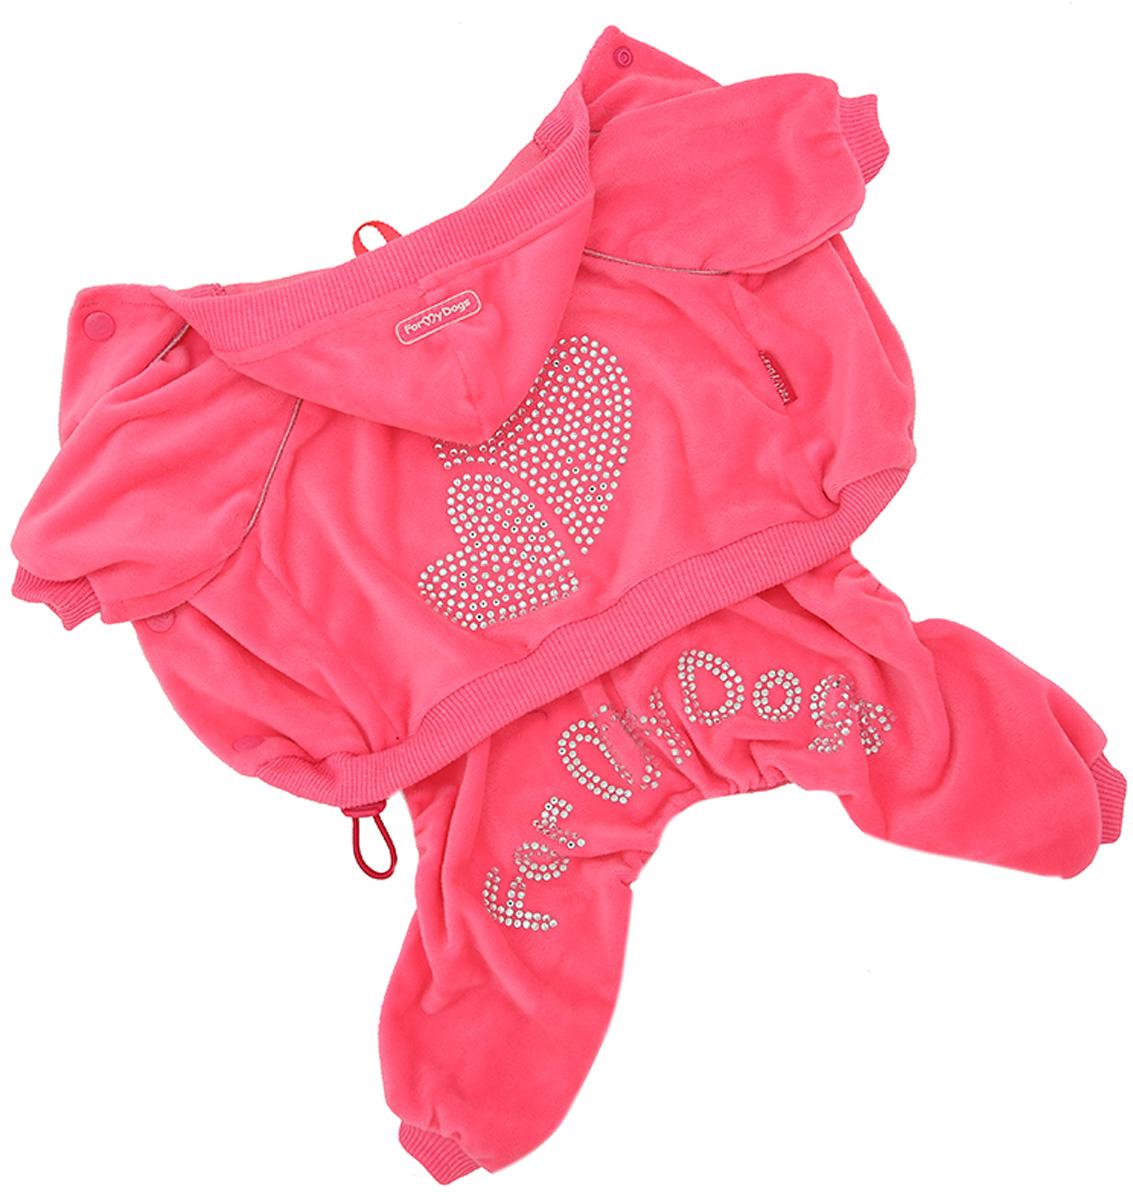 For My Dogs костюм для собак велюр розовый 492ss-2020 P (8)